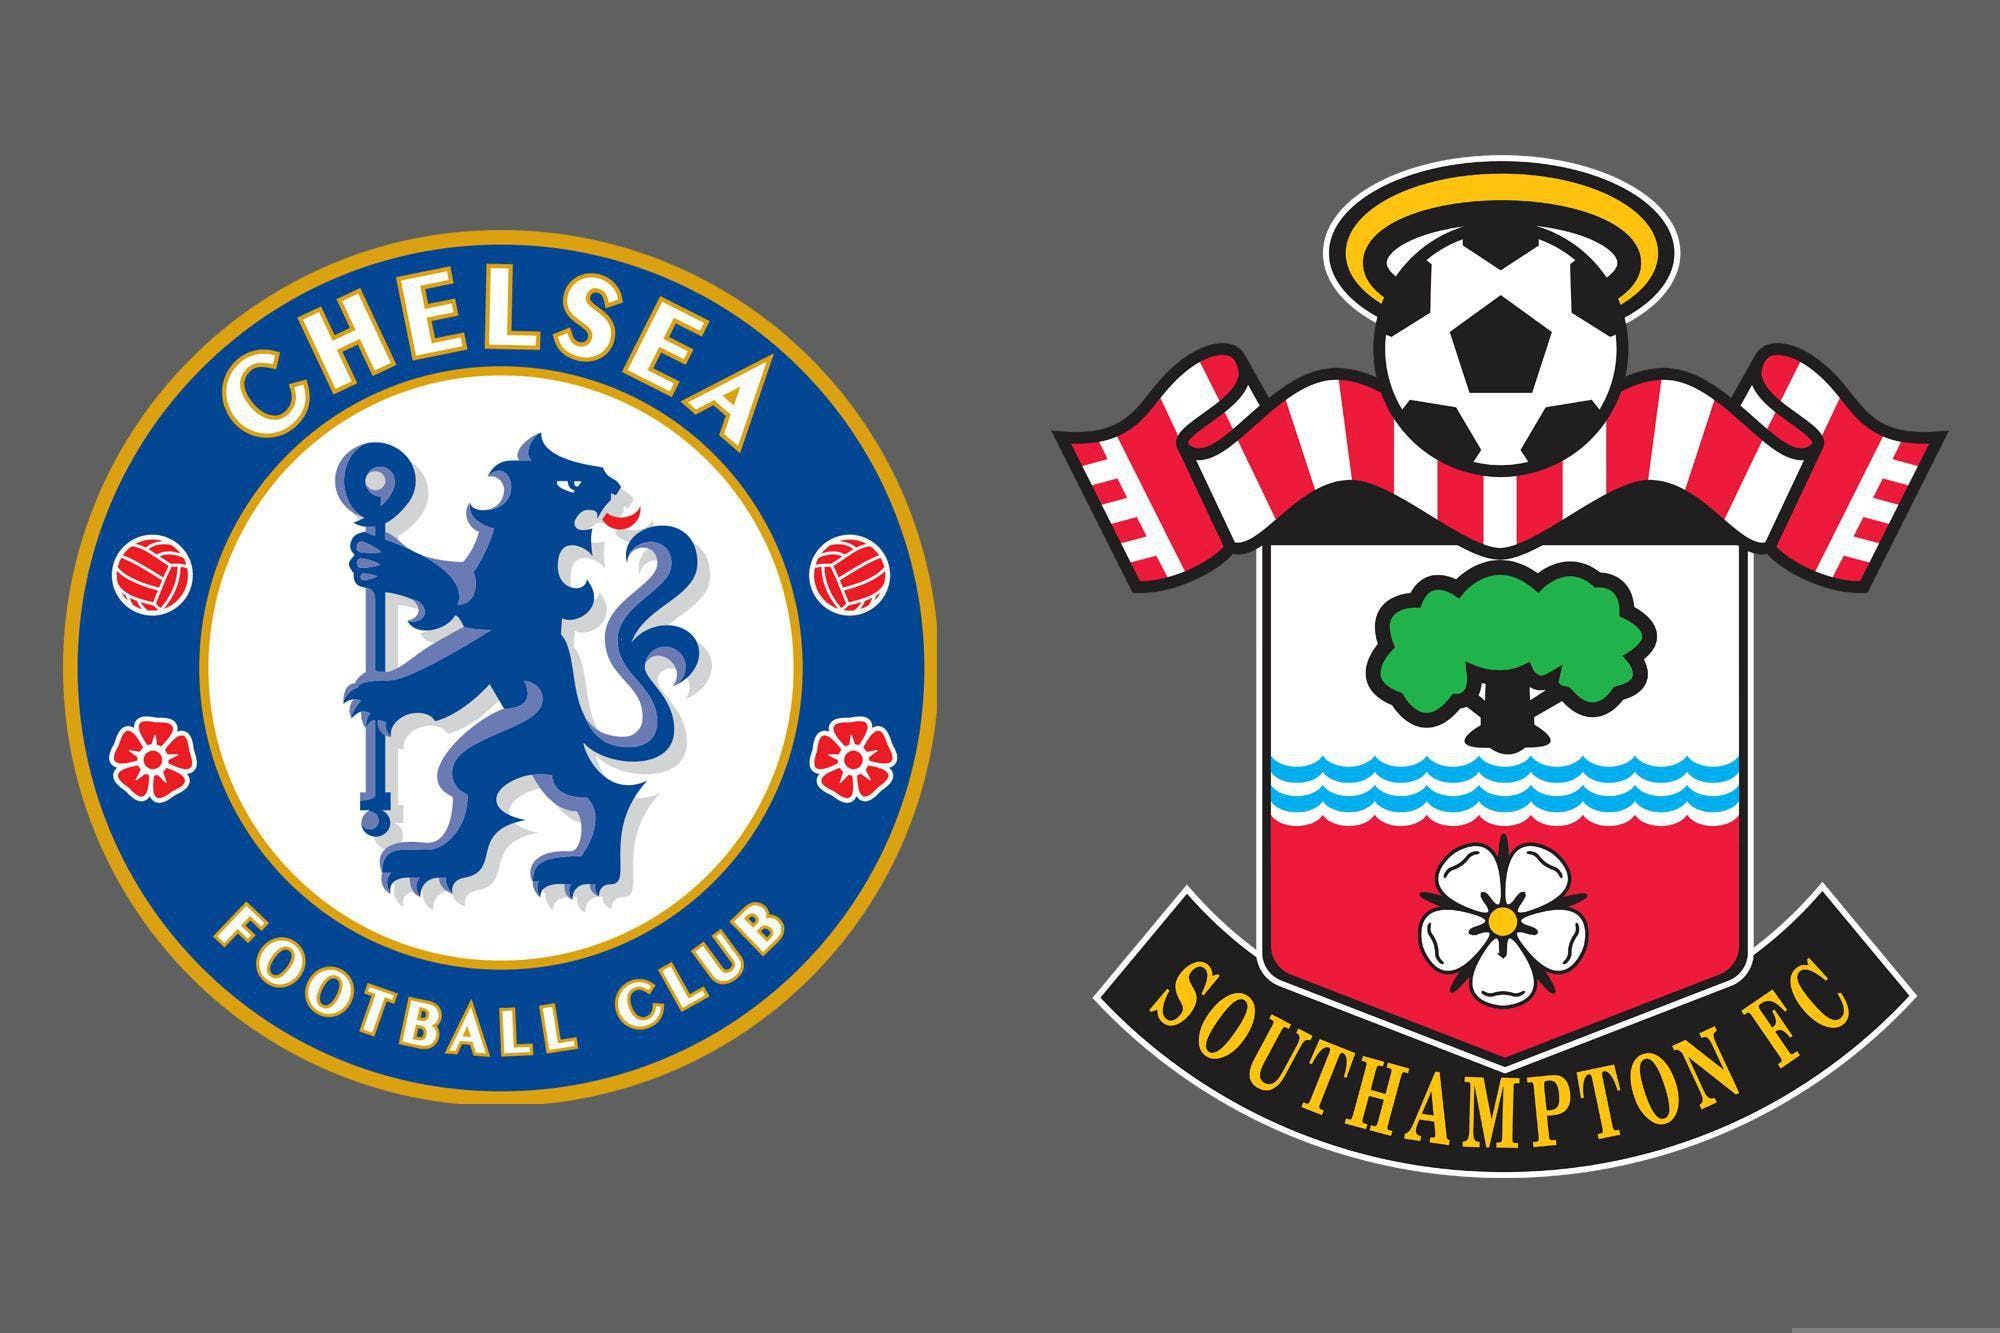 Premier League de Inglaterra: Chelsea y Southampton empataron 3-3